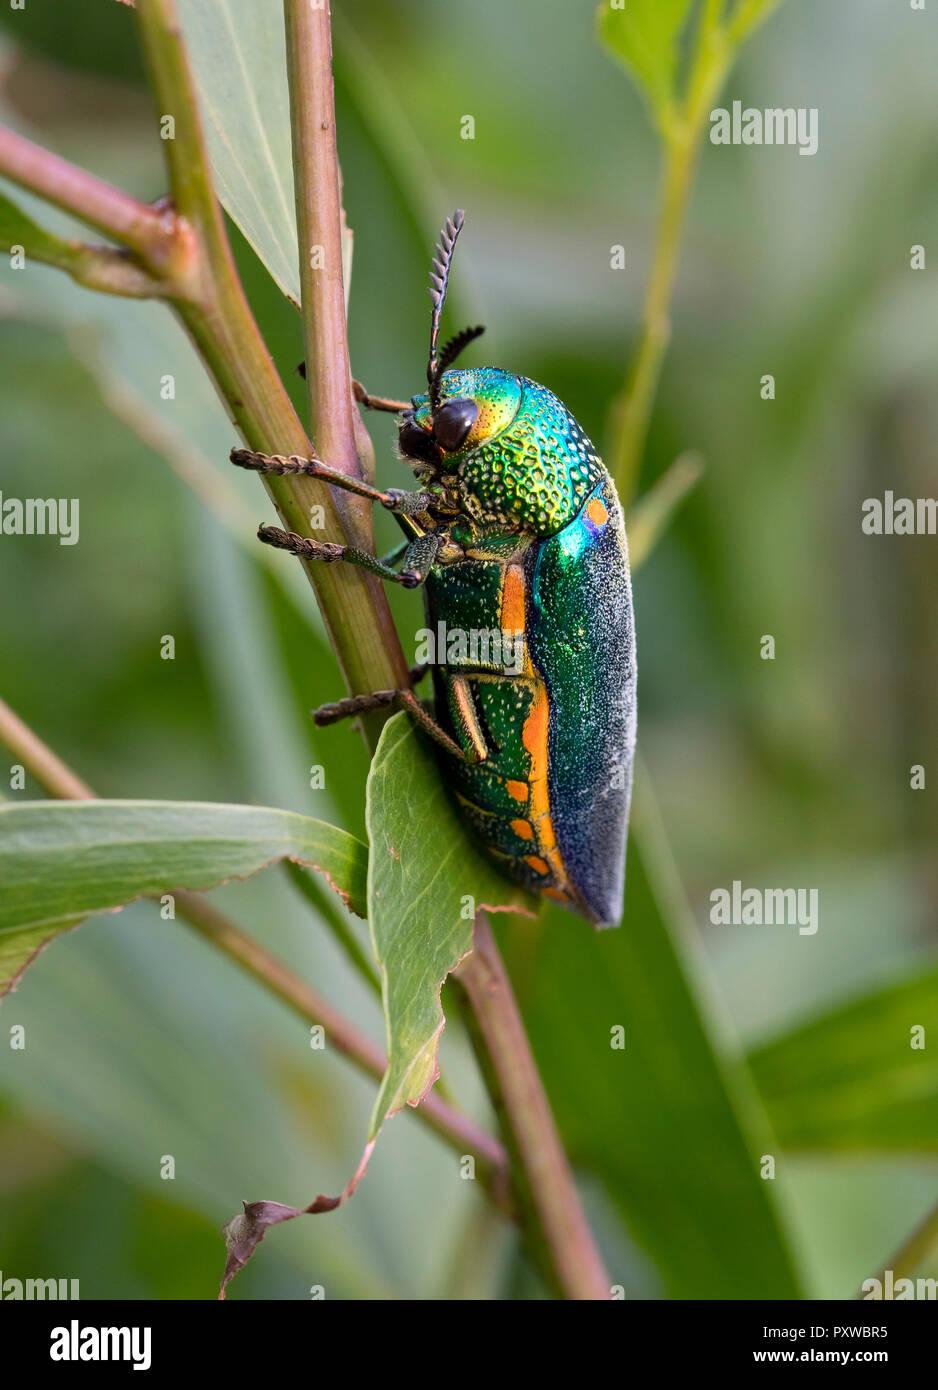 Thailand, Jewel beetle, Buprestidae - Stock Image